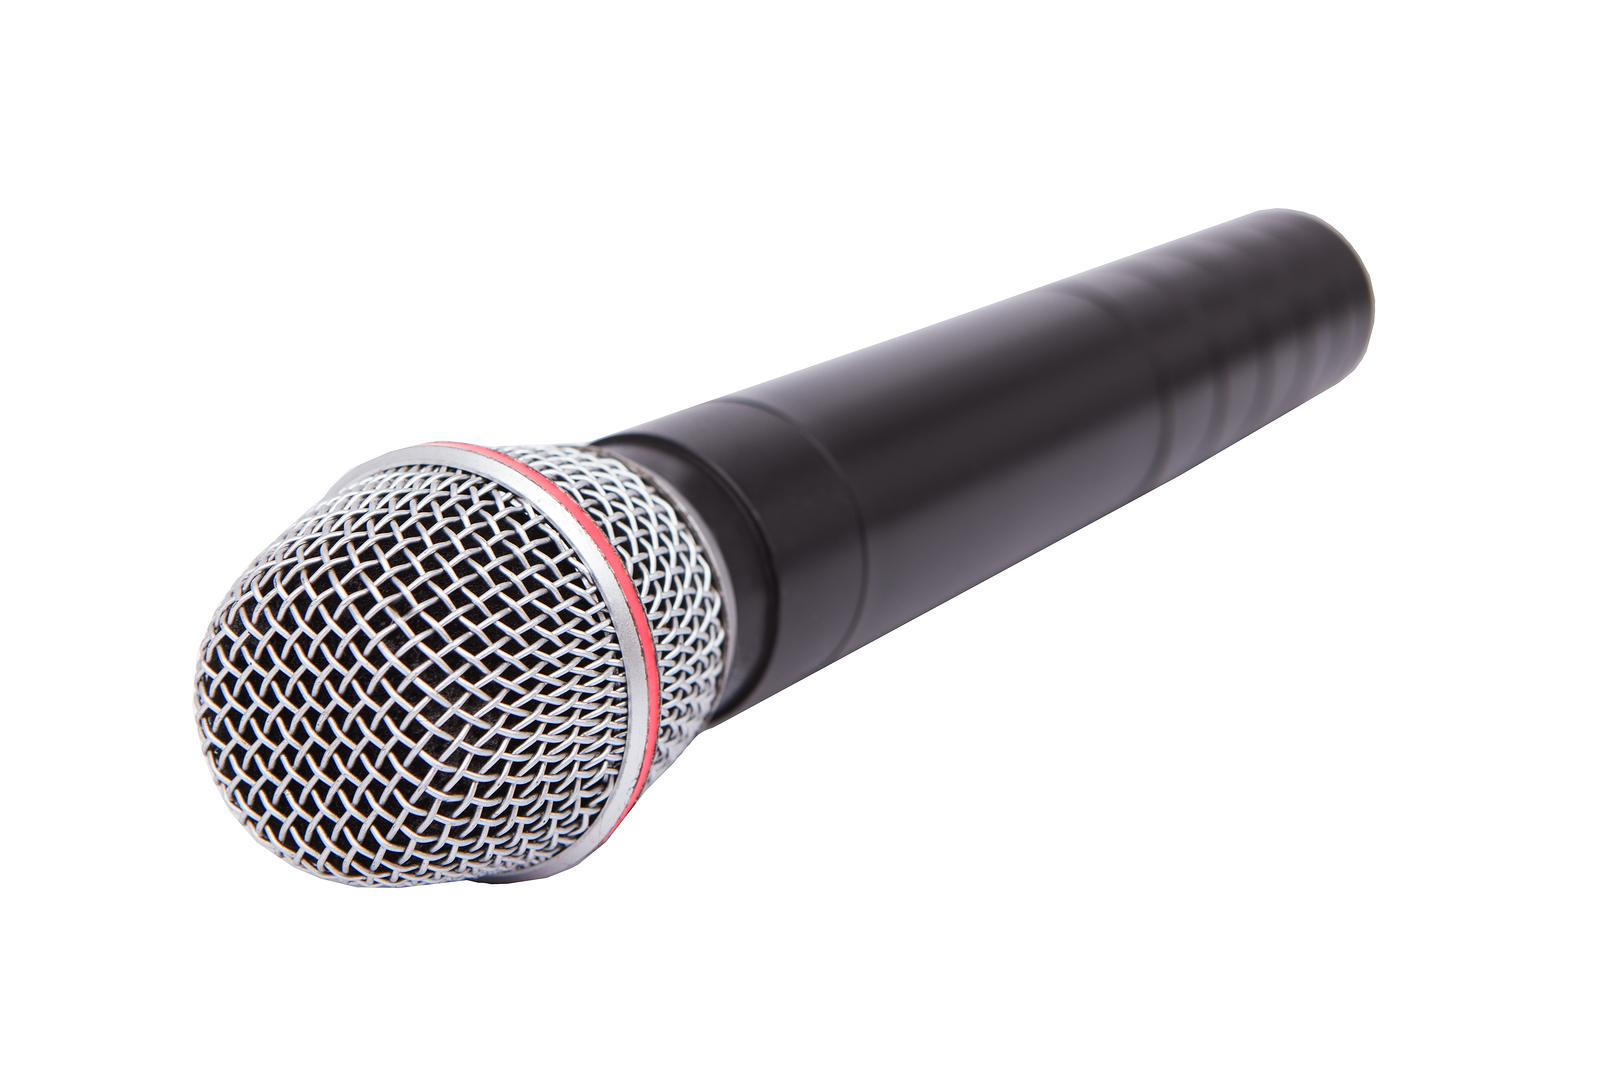 bigstock-Microphone-Isolated-On-White-B-254097847.jpg